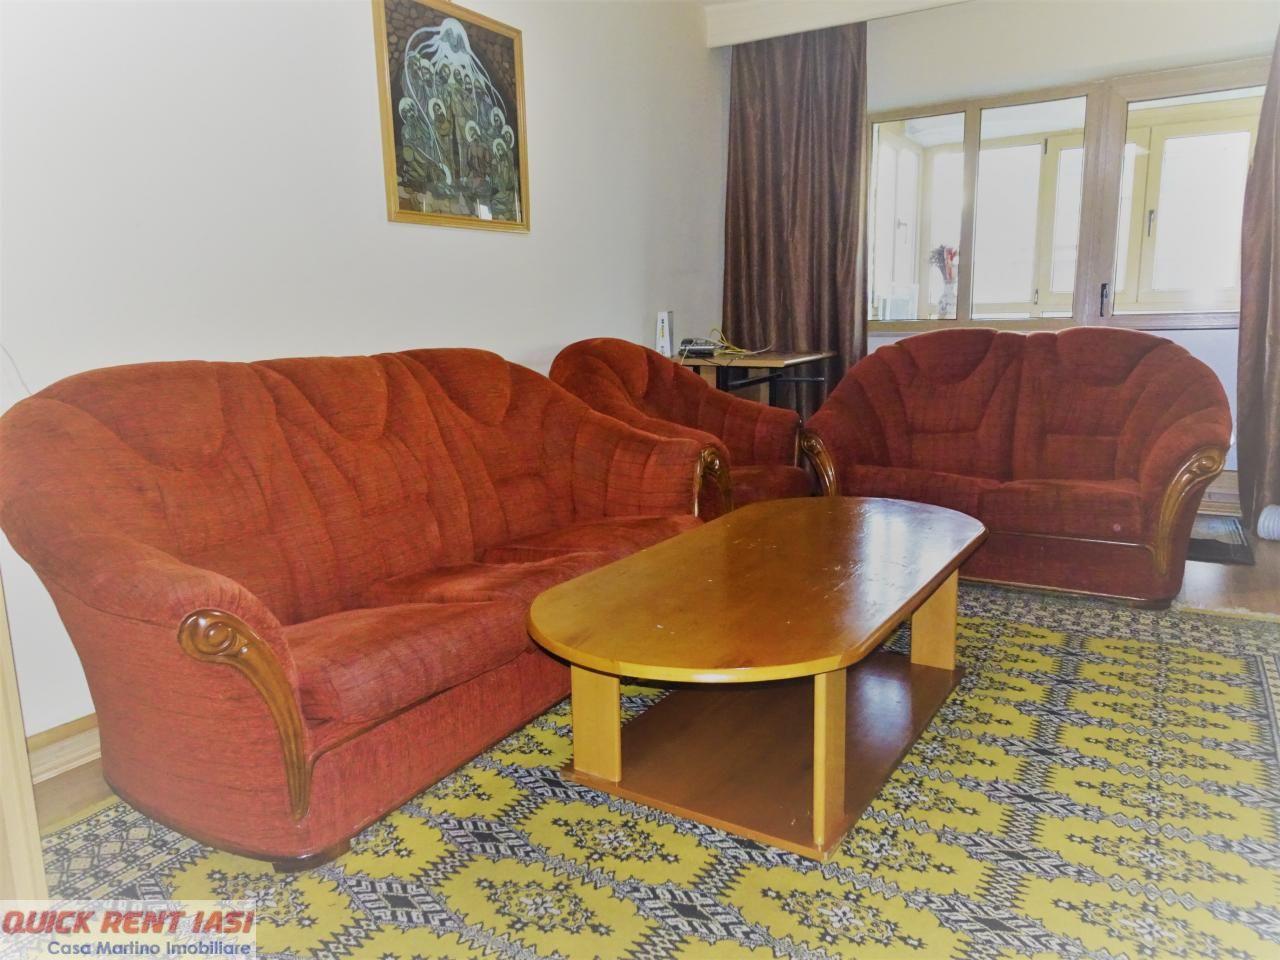 Apartament de inchiriat, Iași (judet), Strada Cuza Vodă - Foto 3